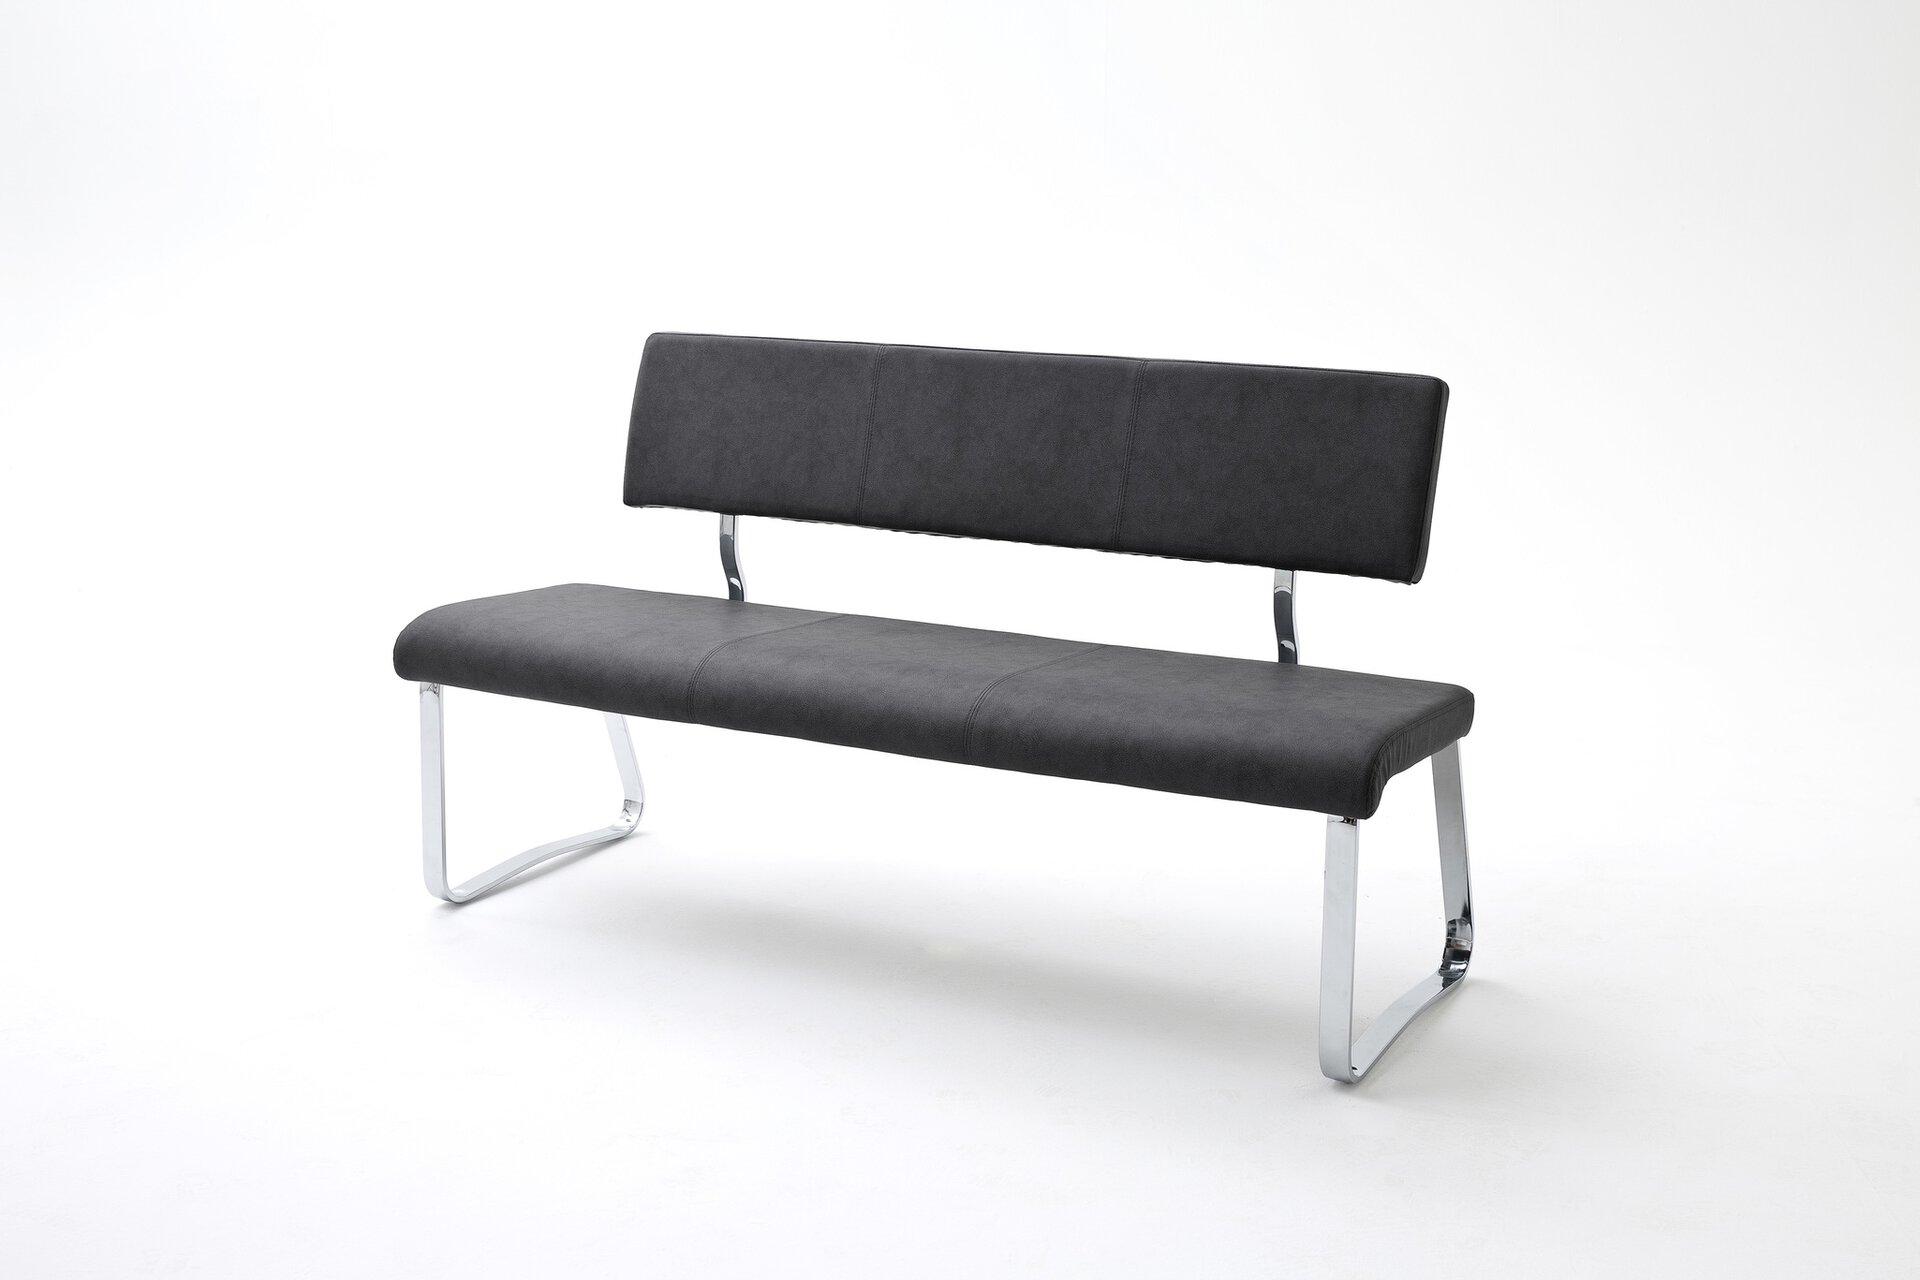 Sitzbank TIA MCA furniture Textil mehrfarbig 58 x 85 x 155 cm